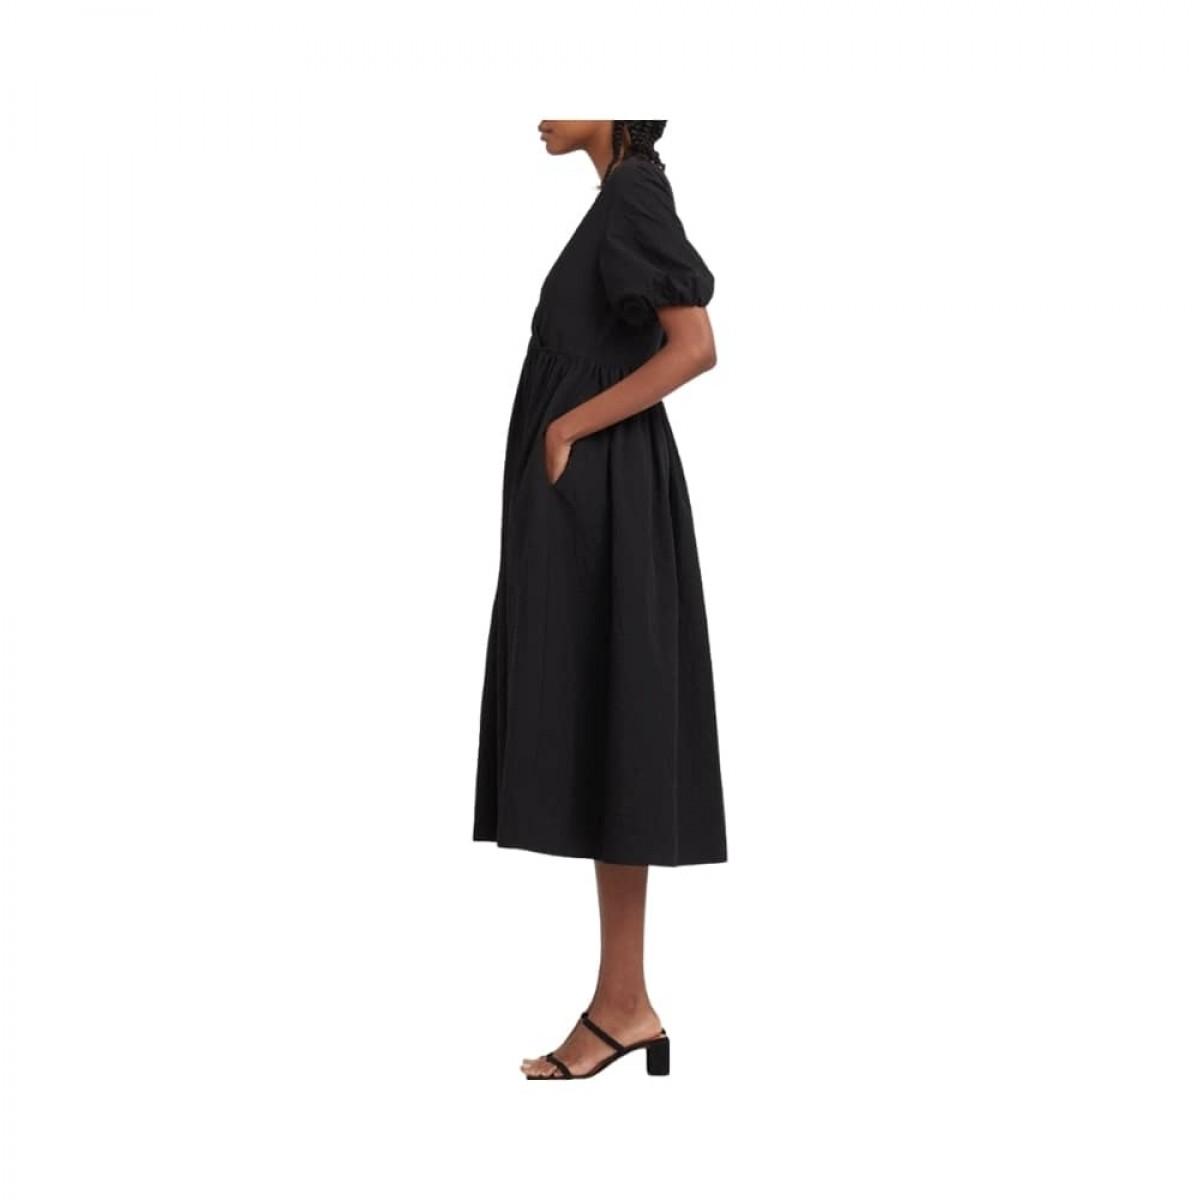 v neck dress with puff sleeves - black - model lomme detalje